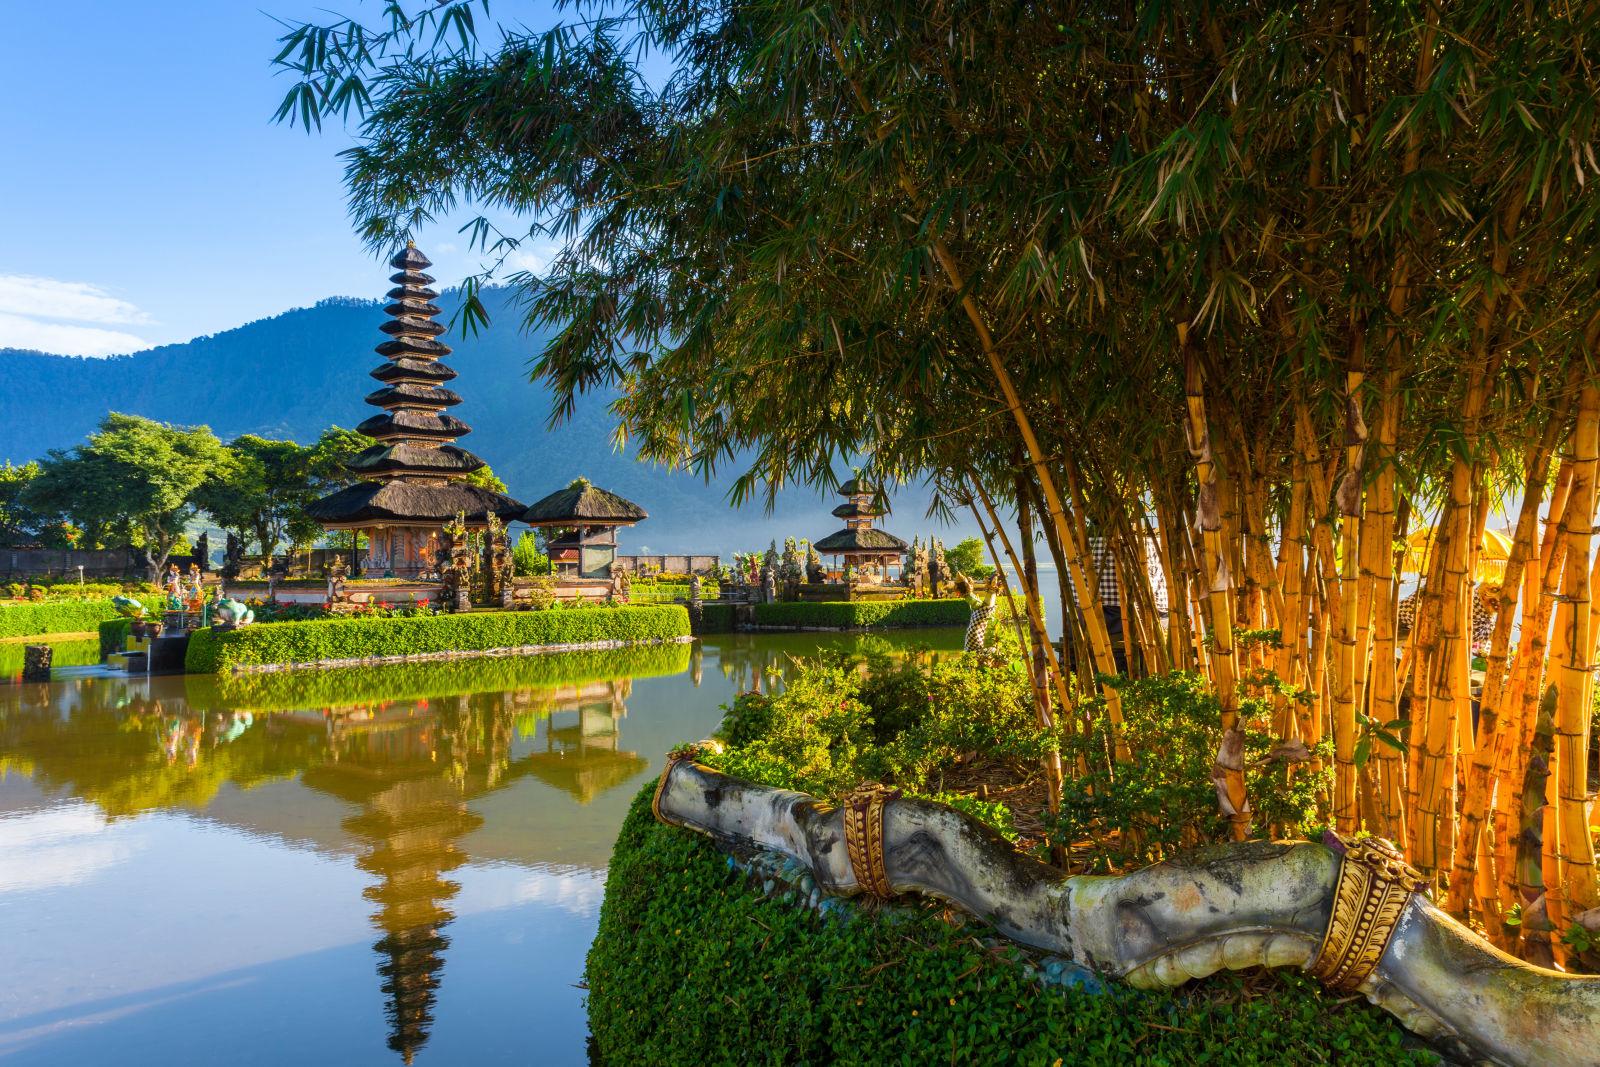 Asia, Bali, Indonesia